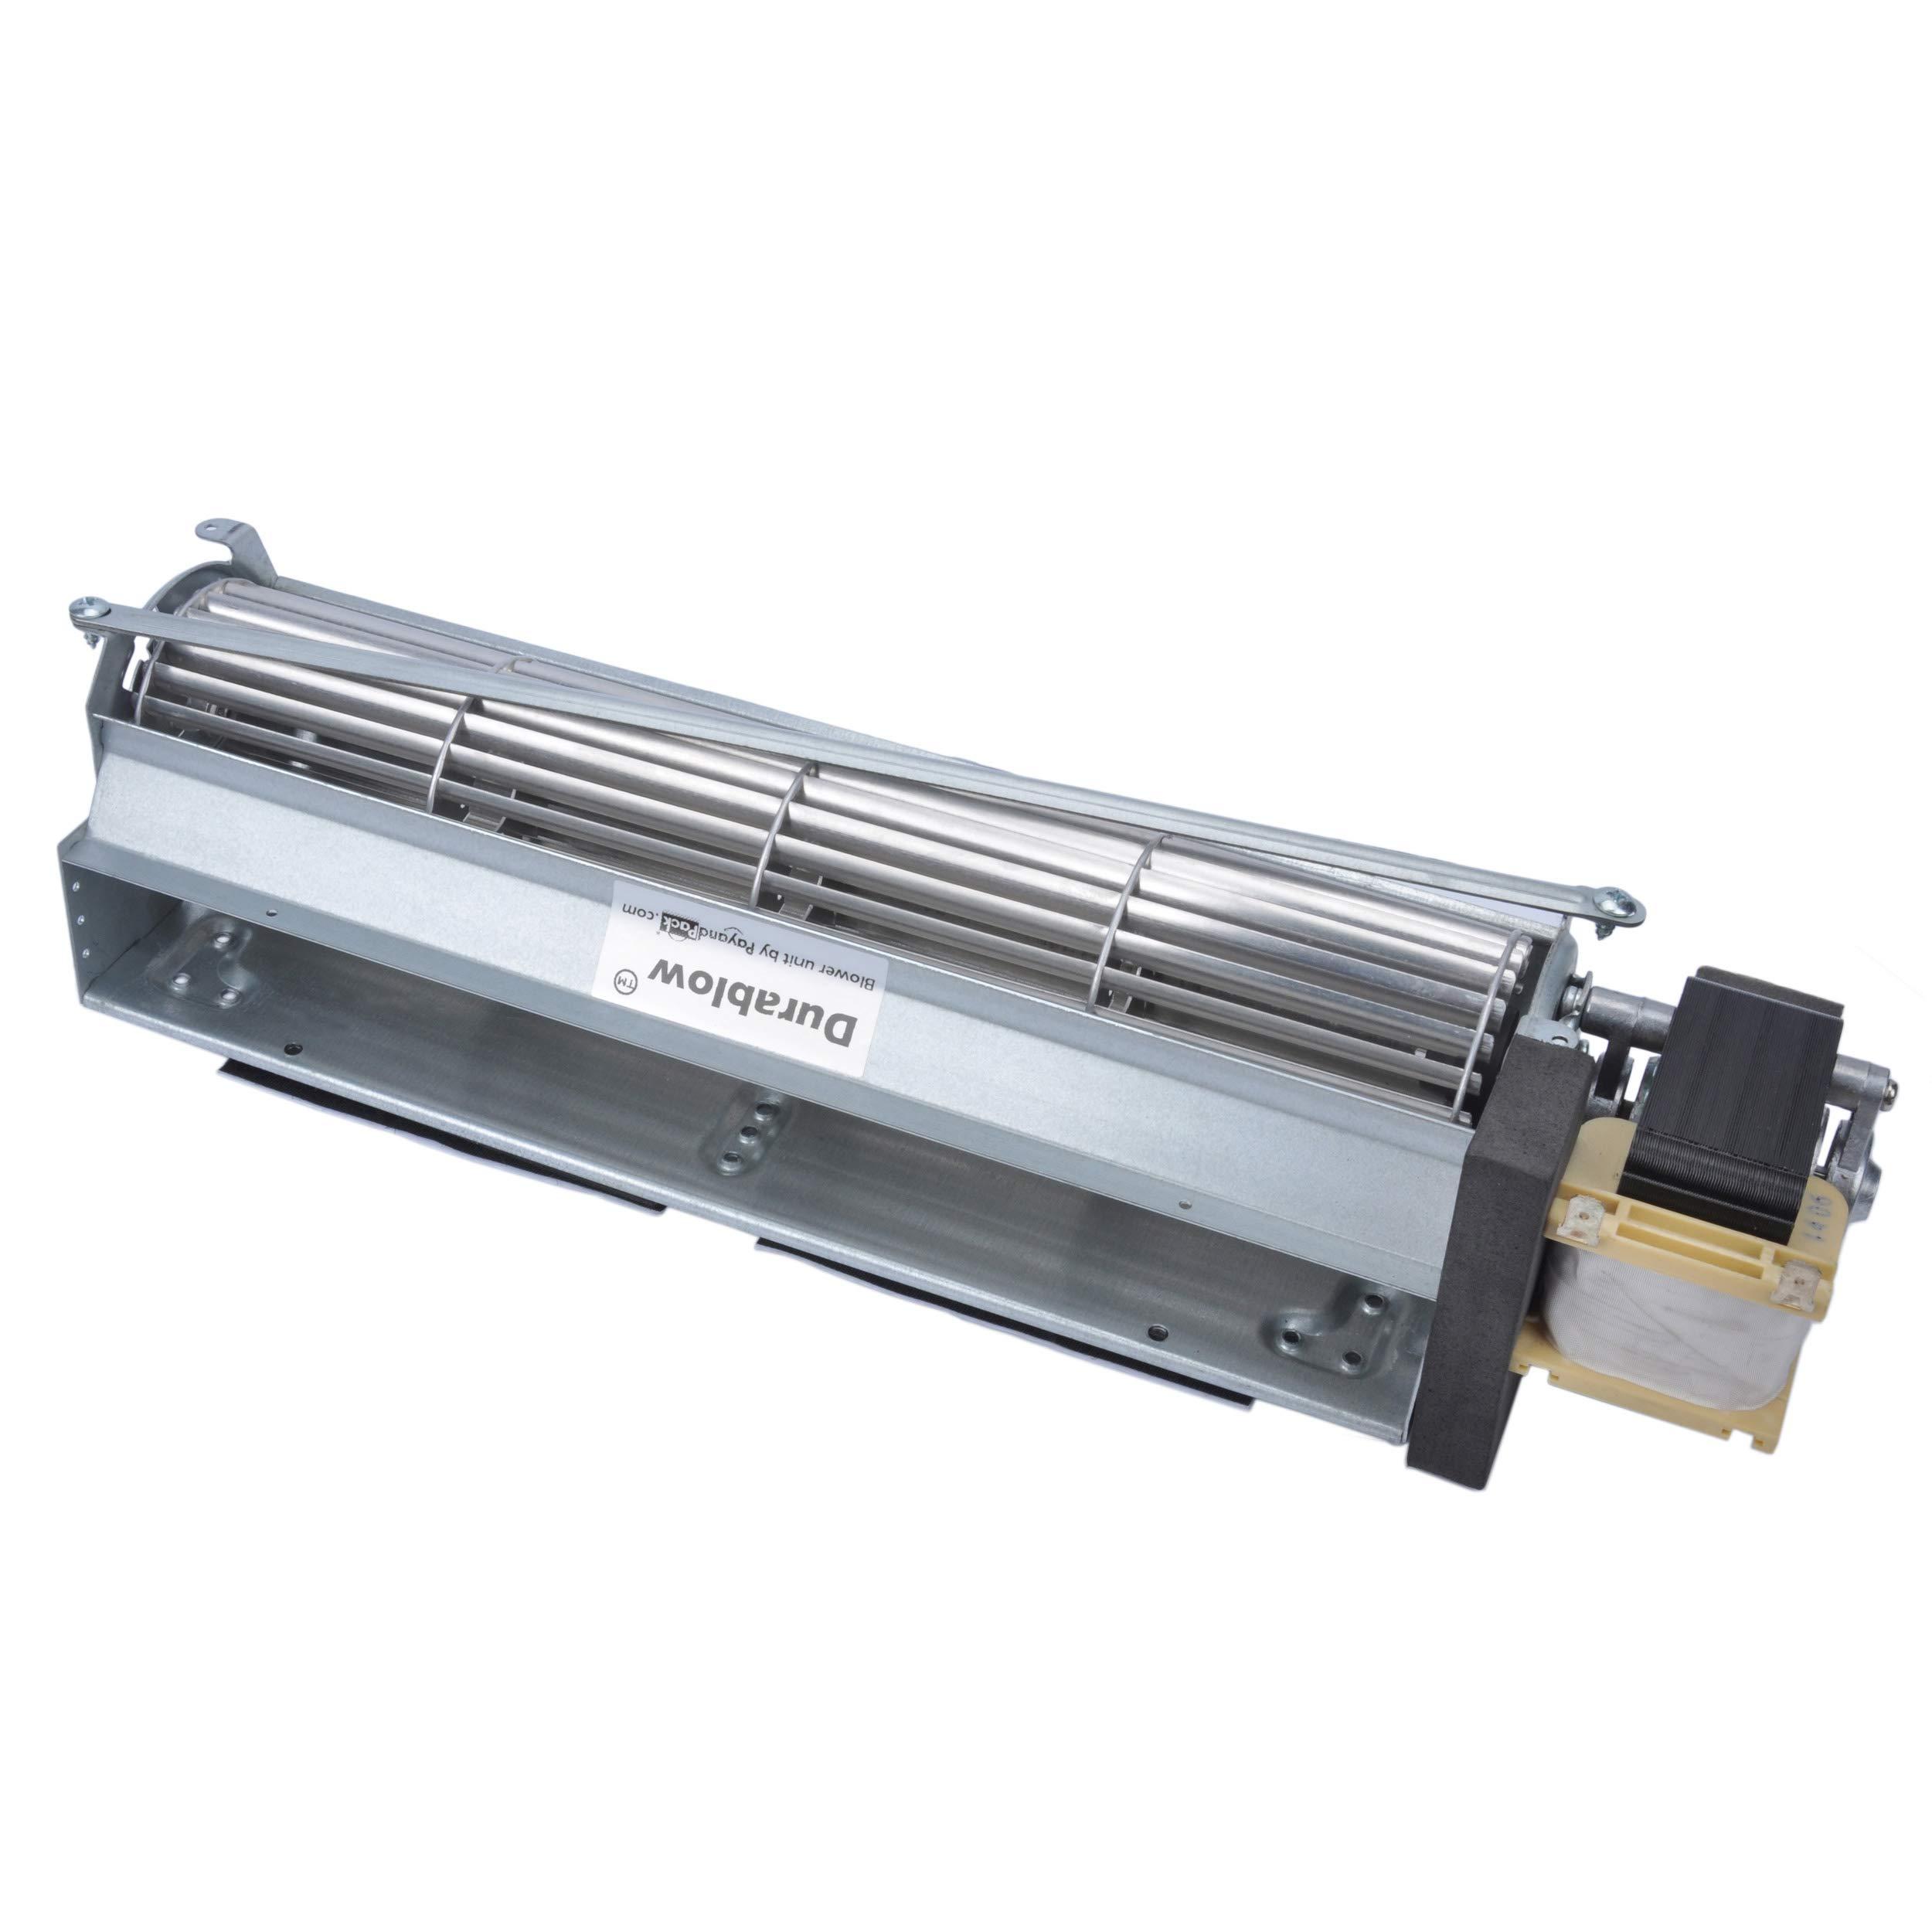 Durablow MFB010 BK BKT GA3650 GA3700 GA3750 Replacment Fireplace Blower Fan Unit for Desa, FMI, Vanguard, Vexar, Comfort Flame Glow, Rotom by Durablow